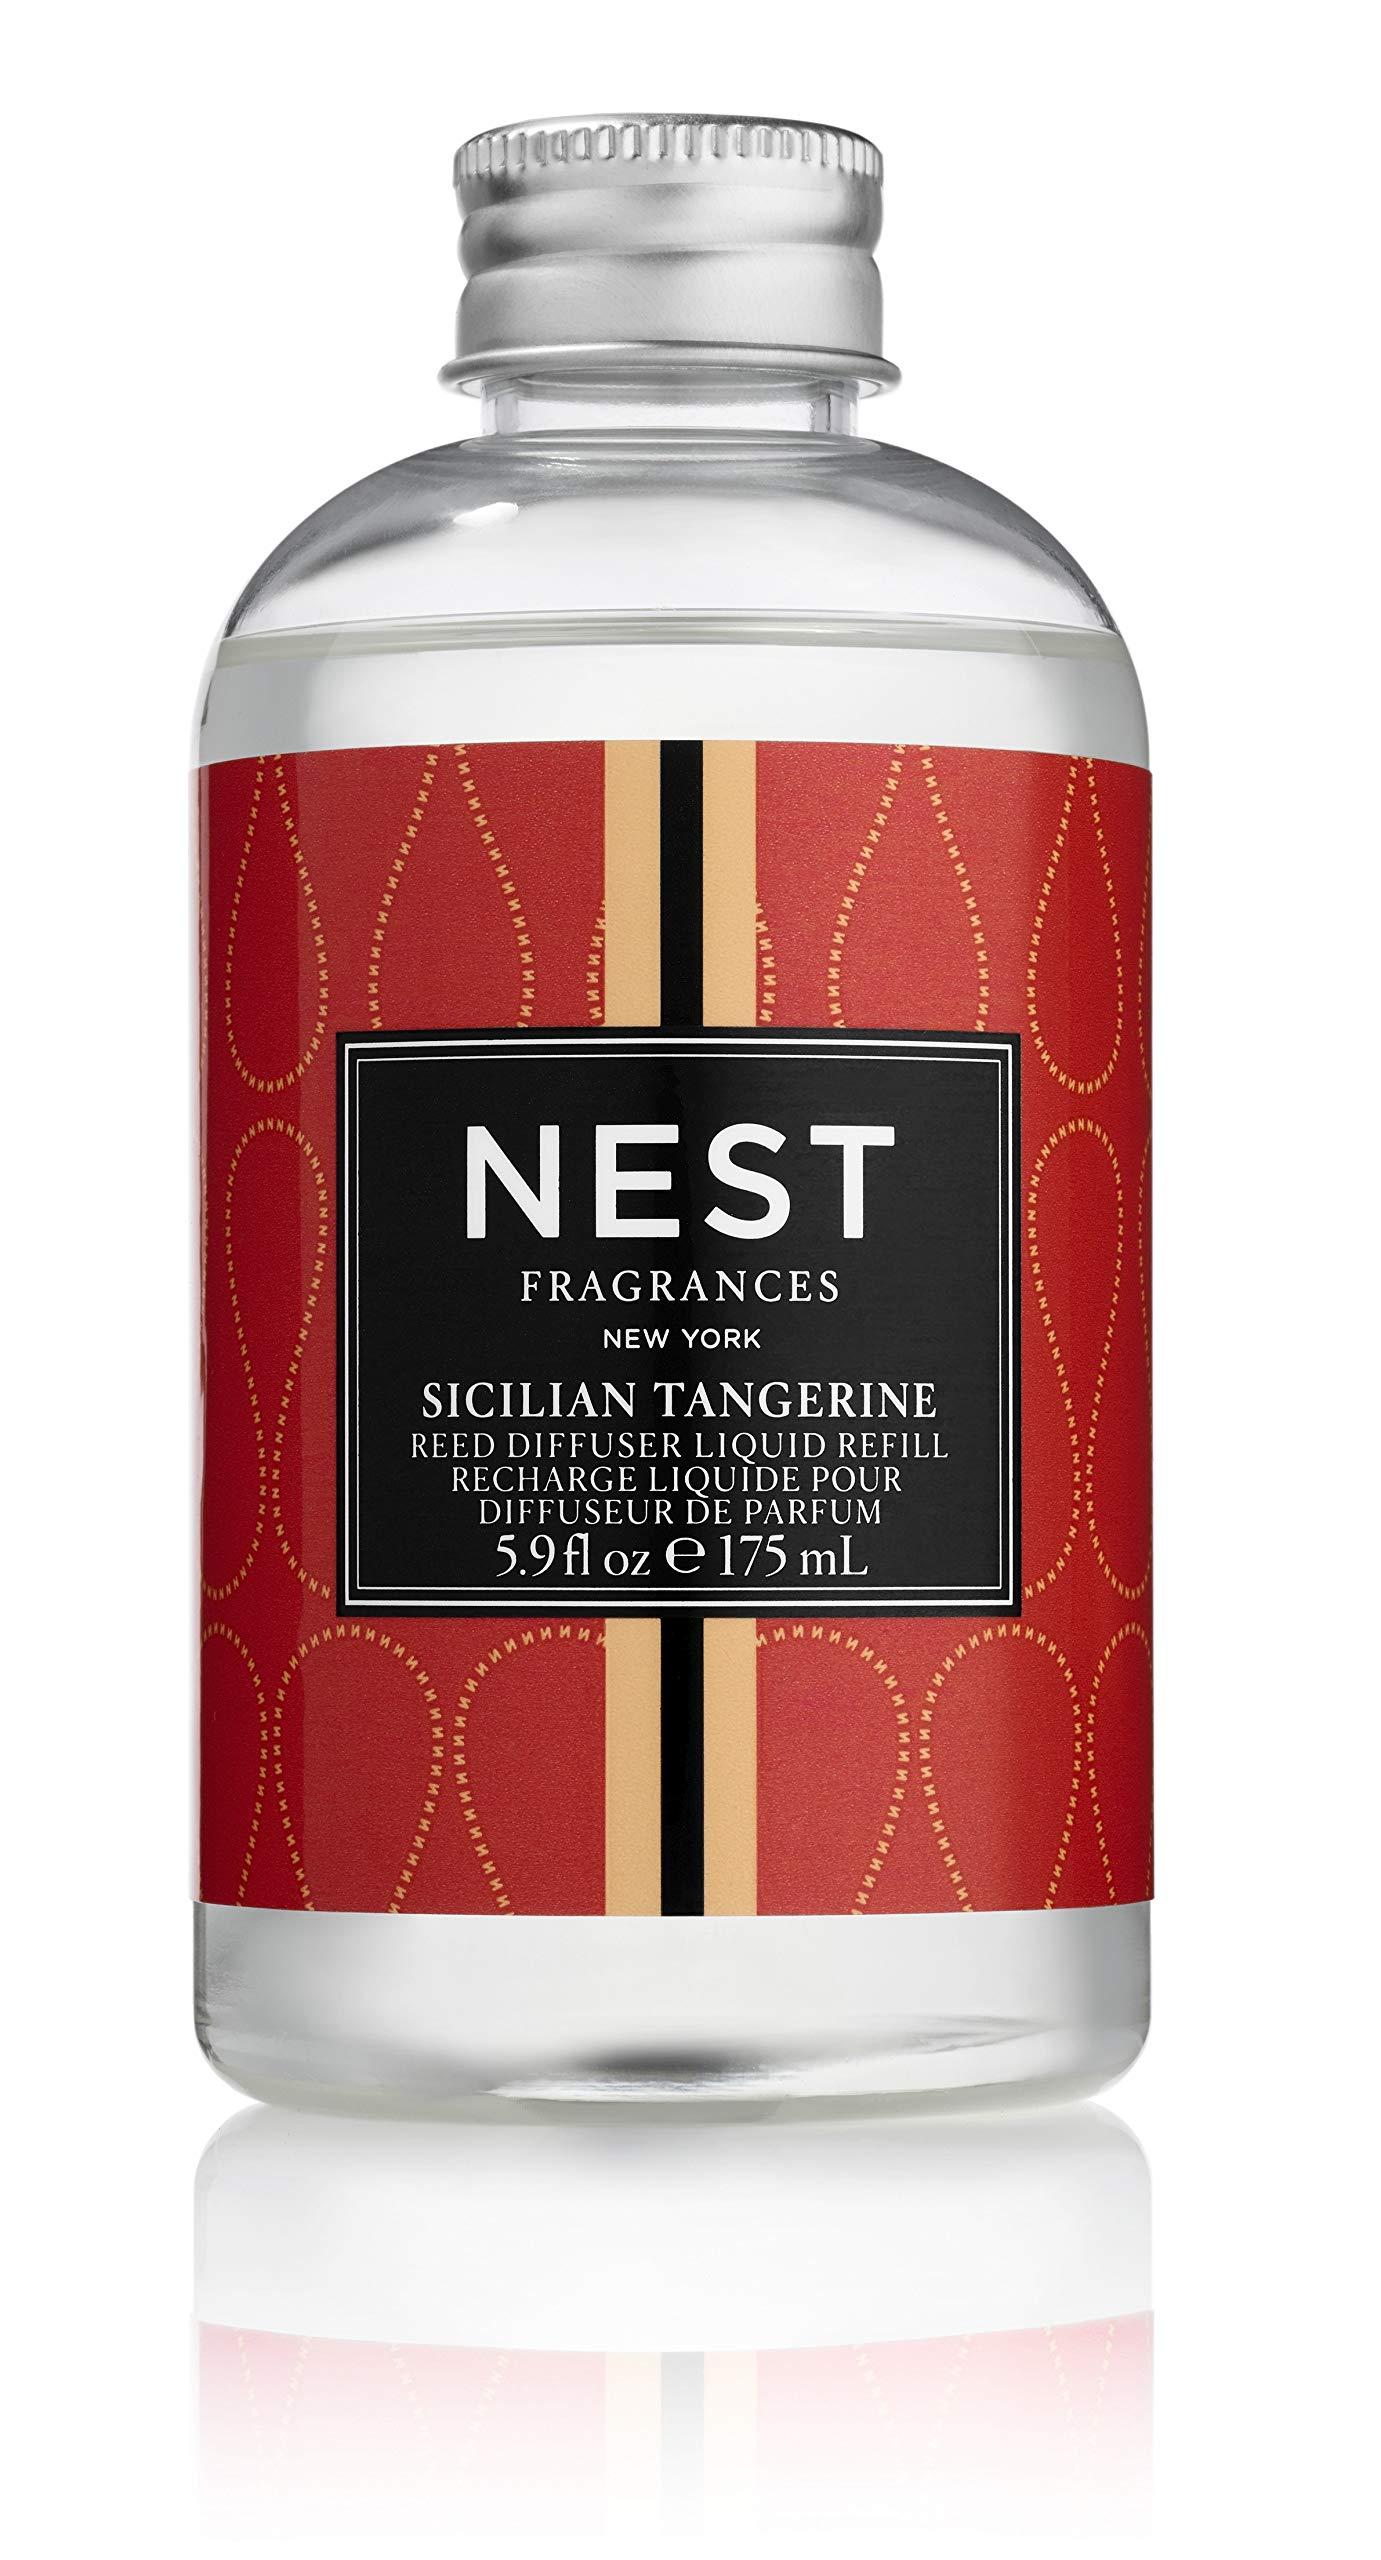 NEST Fragrances Sicilian Tangerine Reed Diffuser Liquid Refill by NEST Fragrances